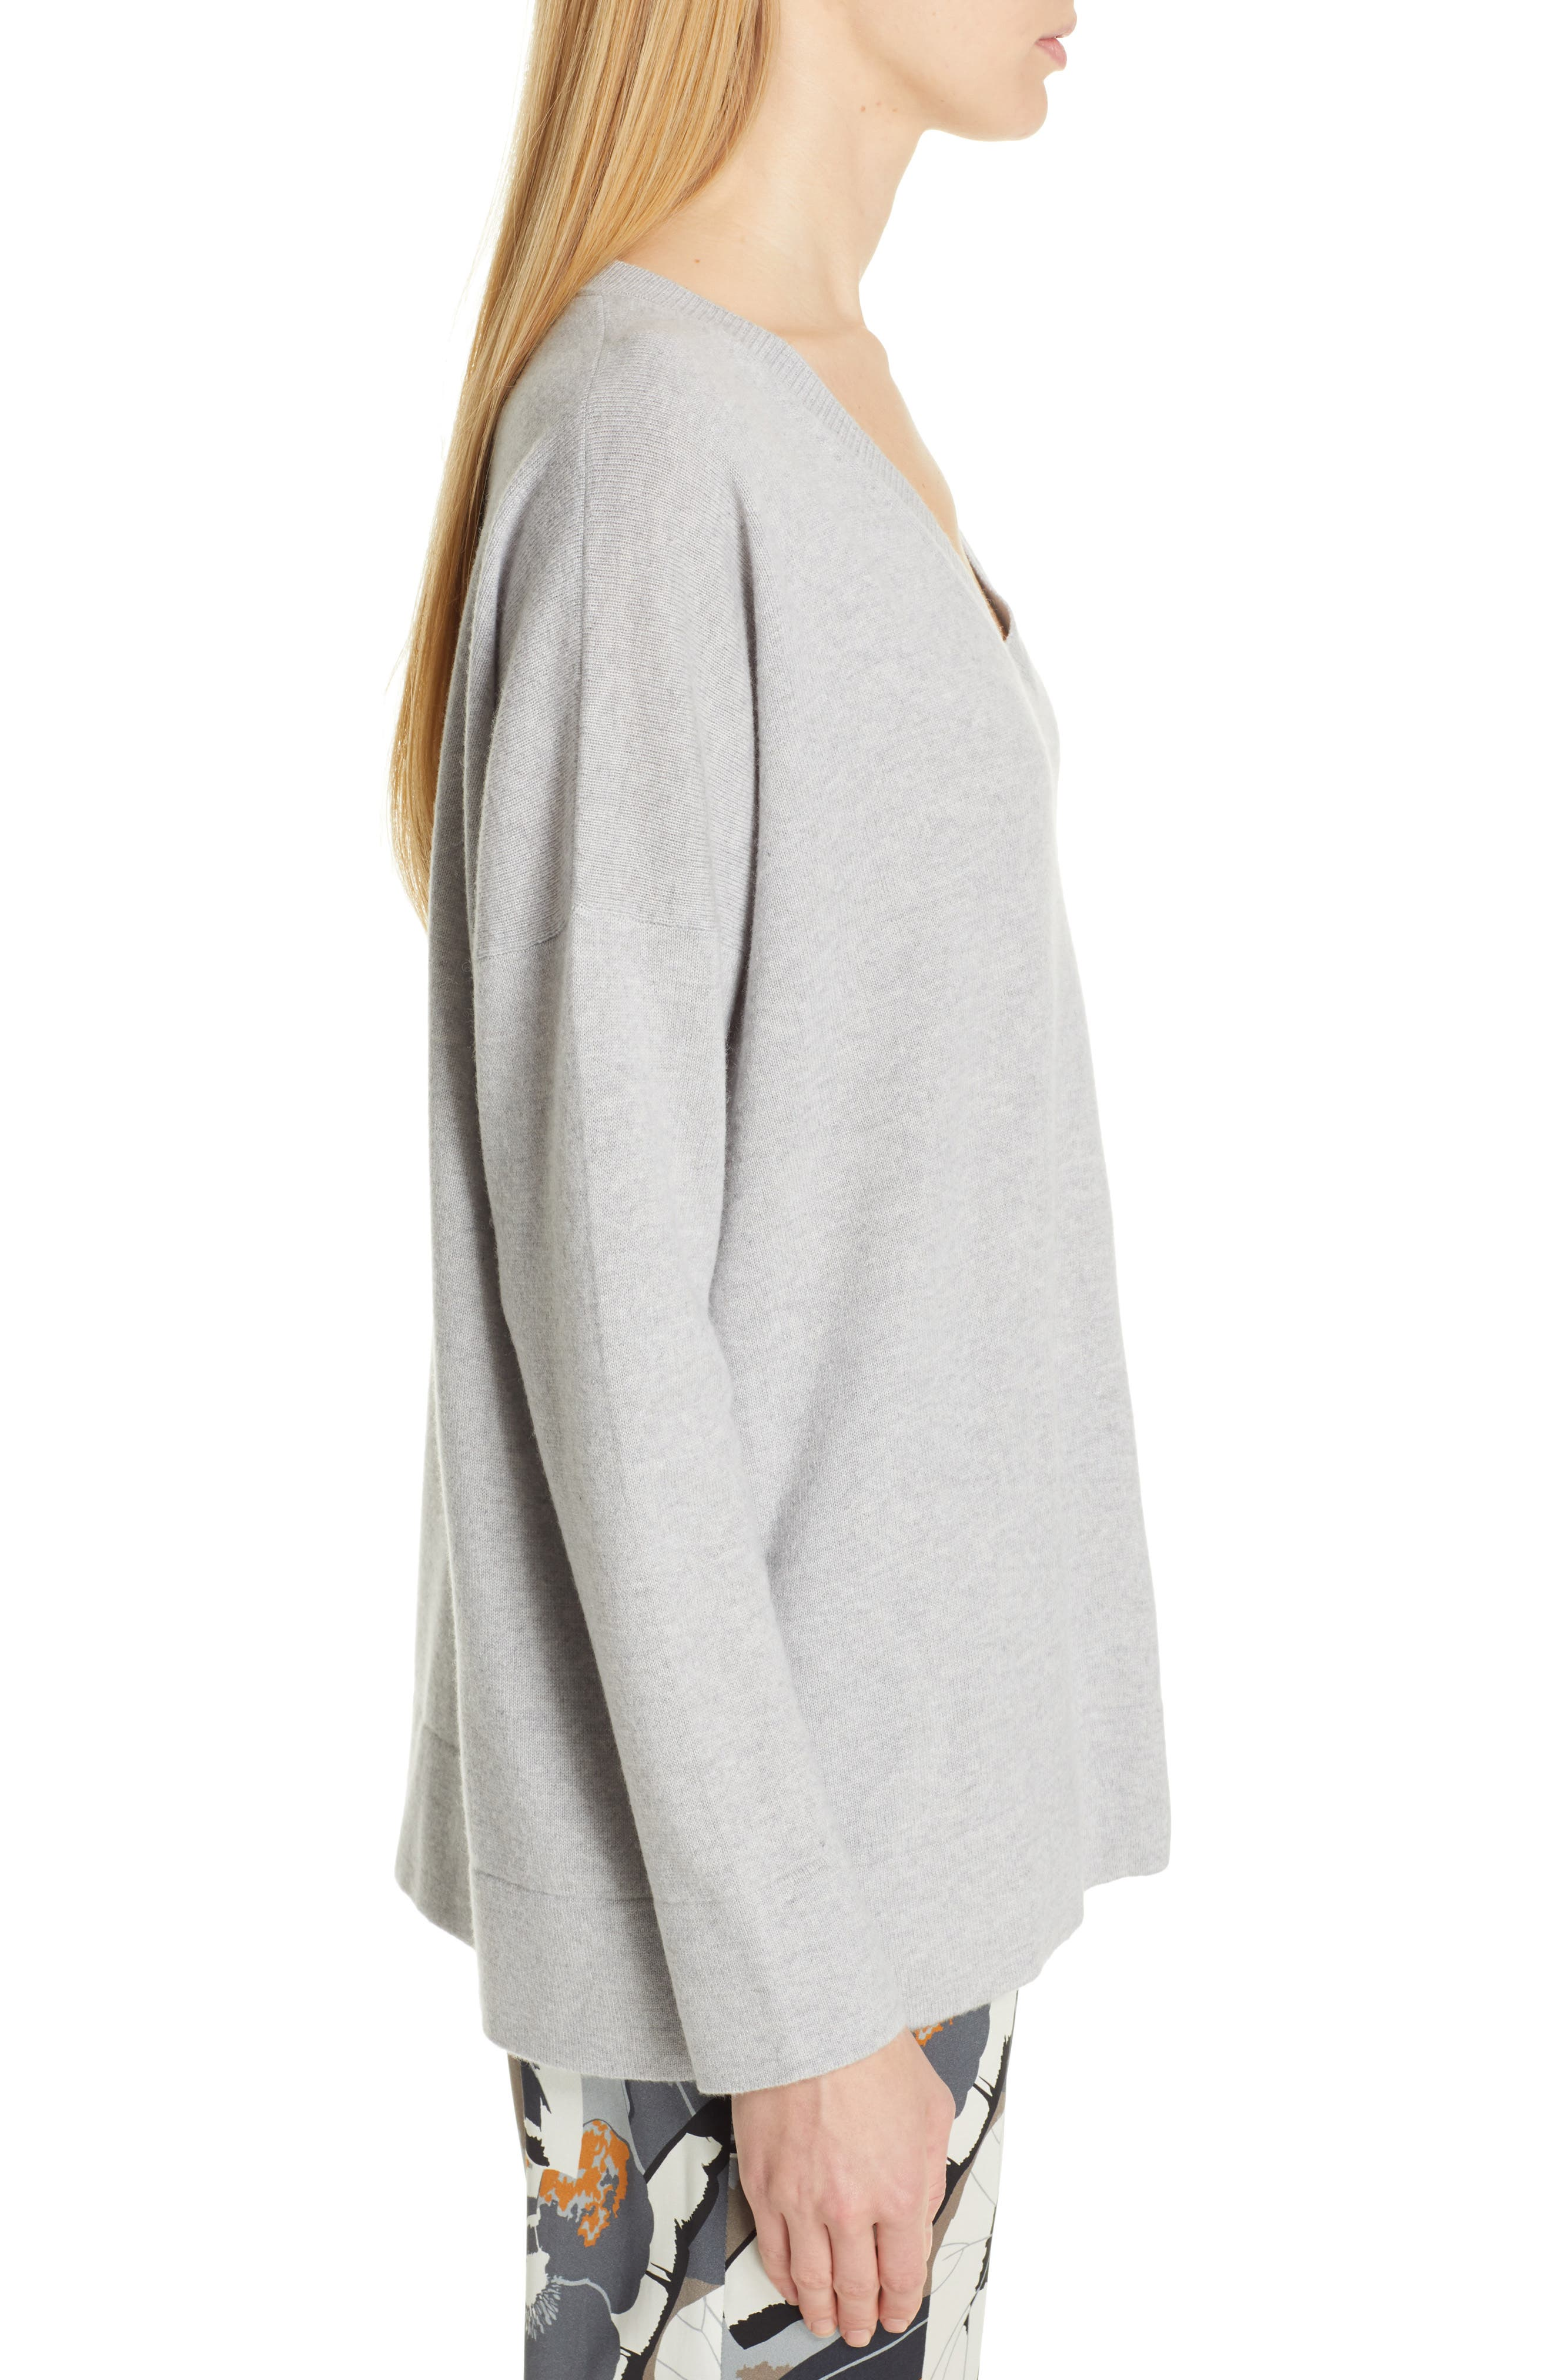 FABIANA FILIPPI,                             Tulle Inset Cashmere Sweater,                             Alternate thumbnail 3, color,                             GREY